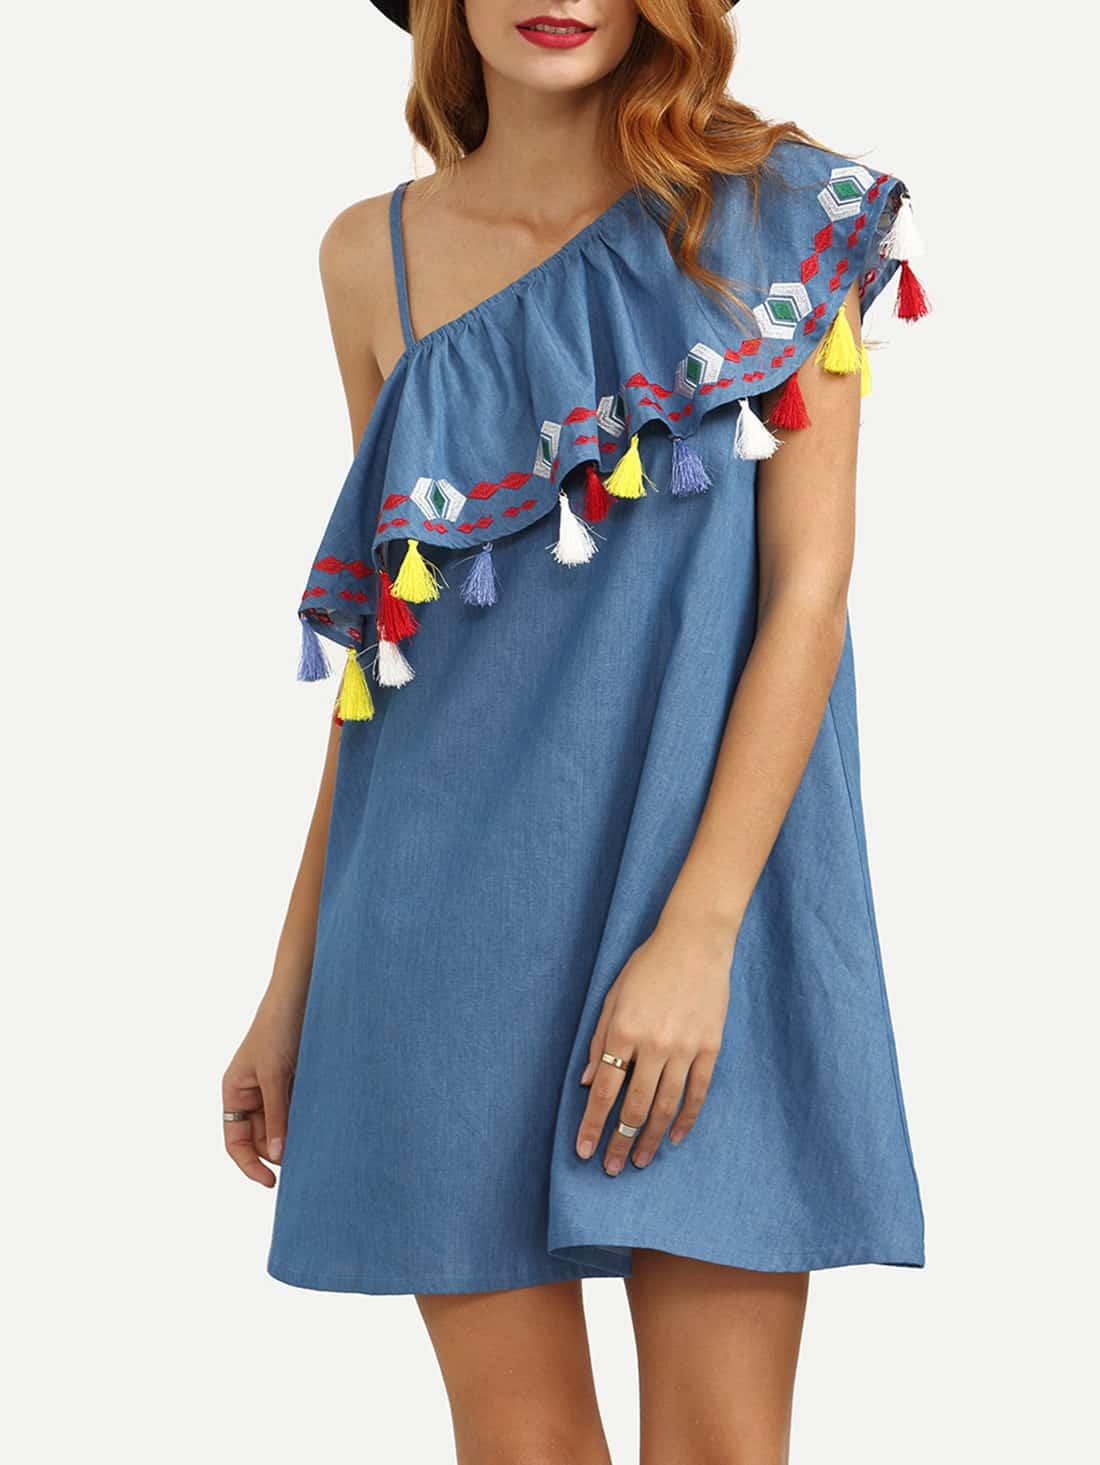 Blue One Shoulder Ruffle Tassel Embroidered DressBlue One Shoulder Ruffle Tassel Embroidered Dress<br><br>color: Blue<br>size: L,M,S,XS